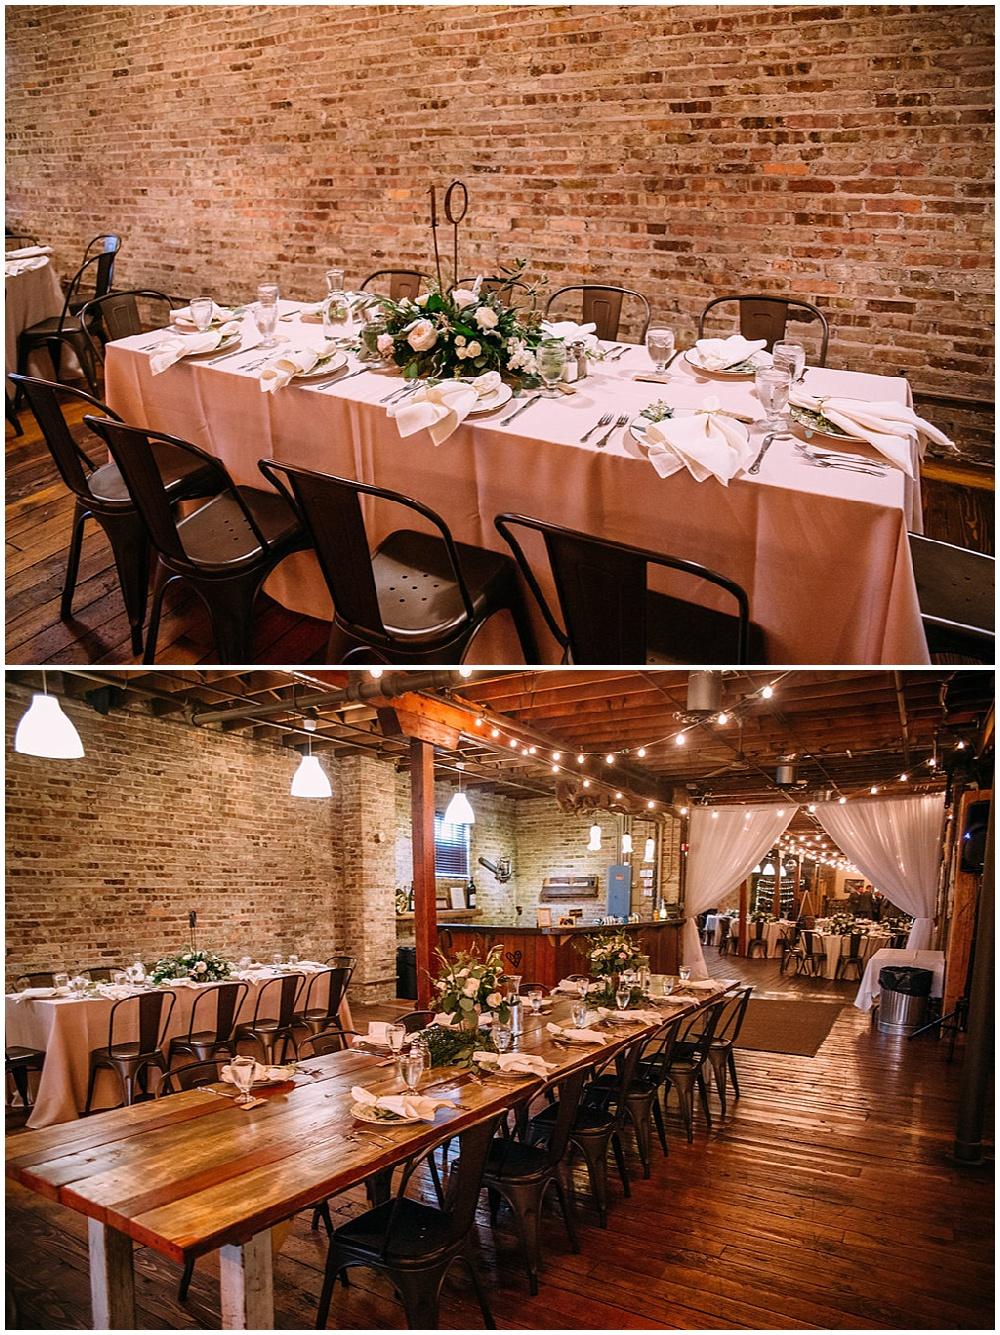 blush reception table with greenery | Chicago urban rustic wedding| Sandra Armenteros Photography | Jessica Dum Wedding Coordination